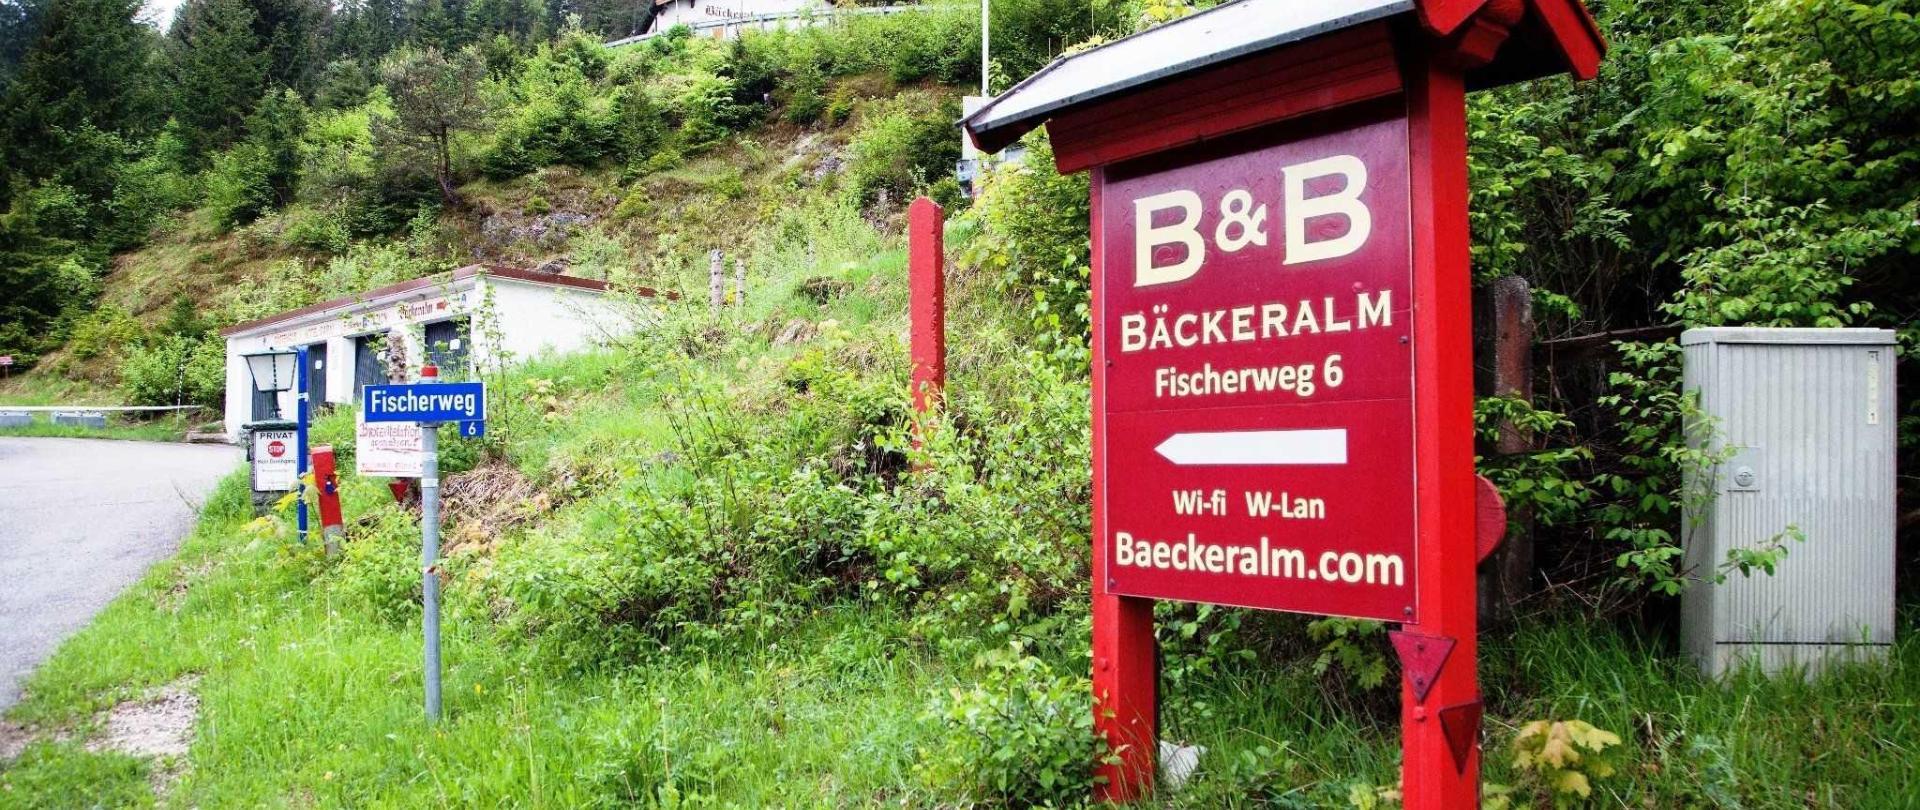 entrancefrommittenwald.jpg